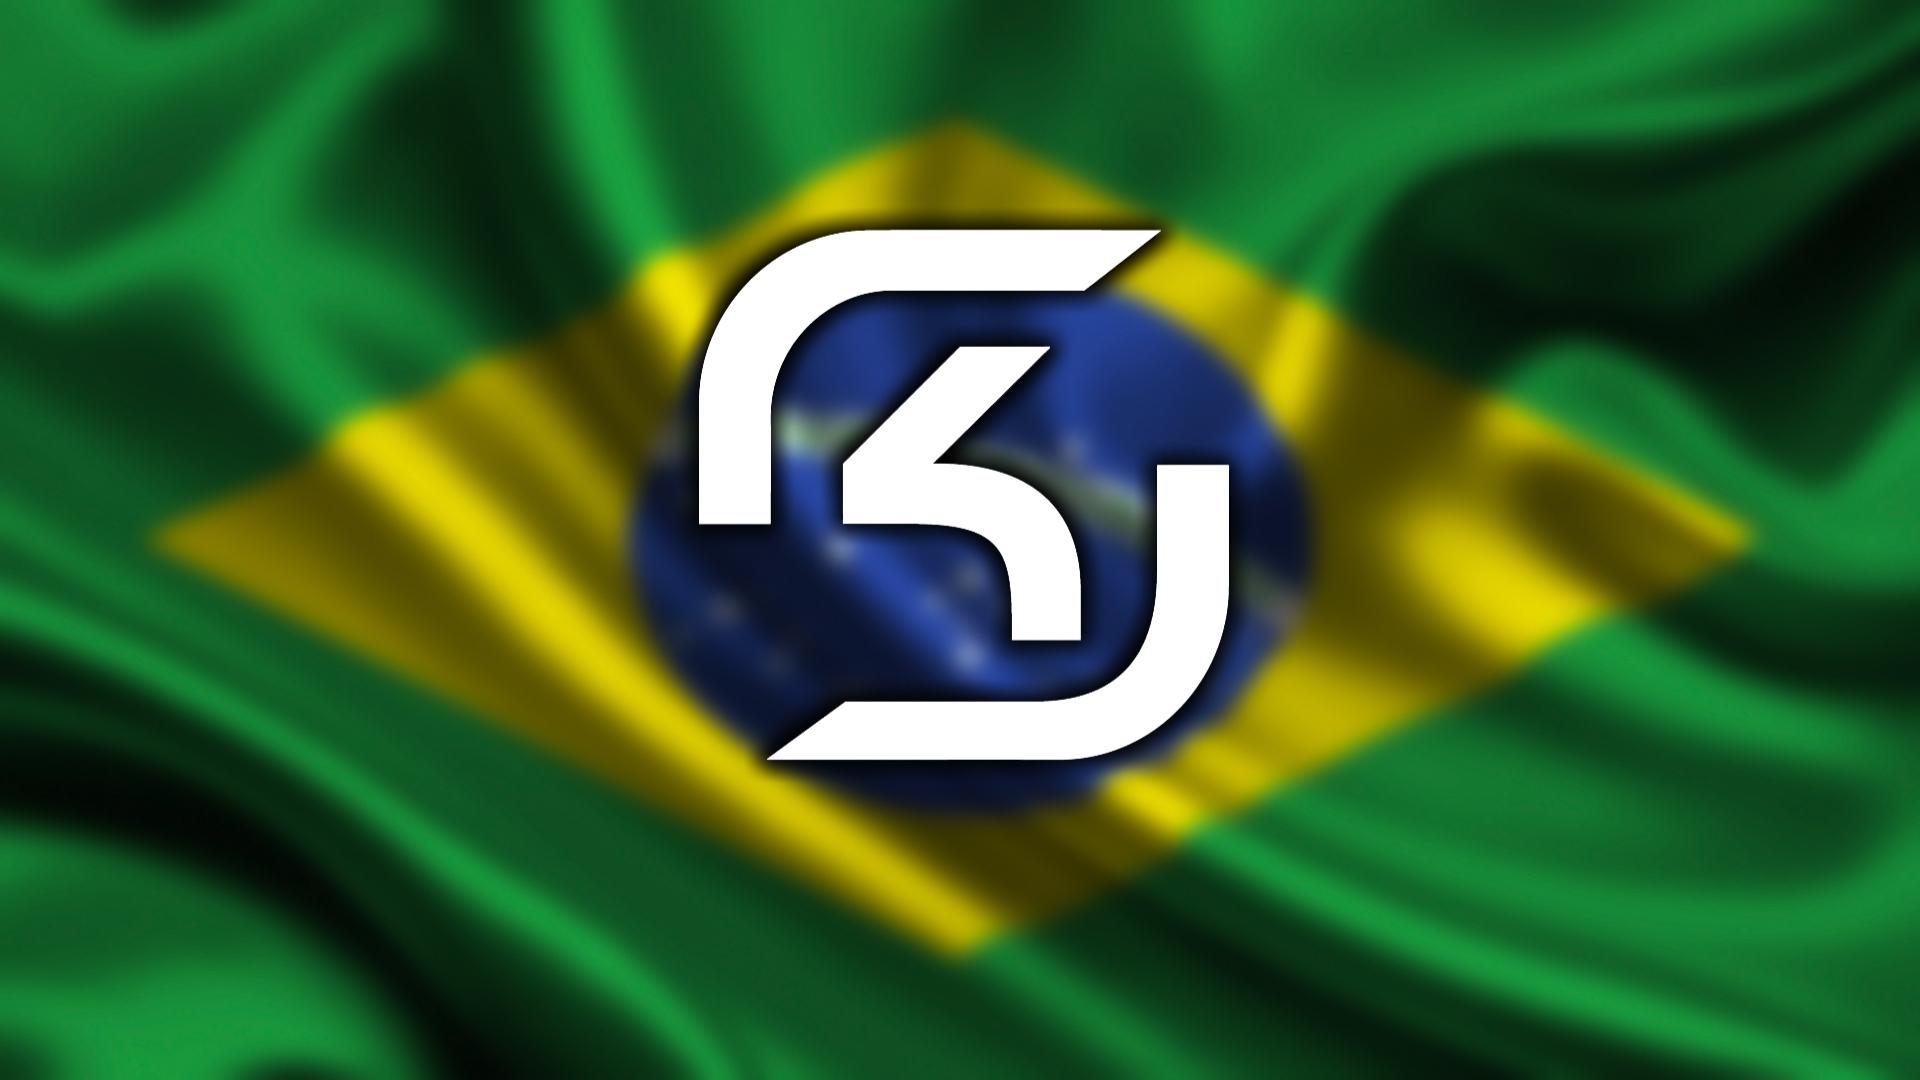 Brazil Hd Wallpaper Iphone - HD Wallpaper